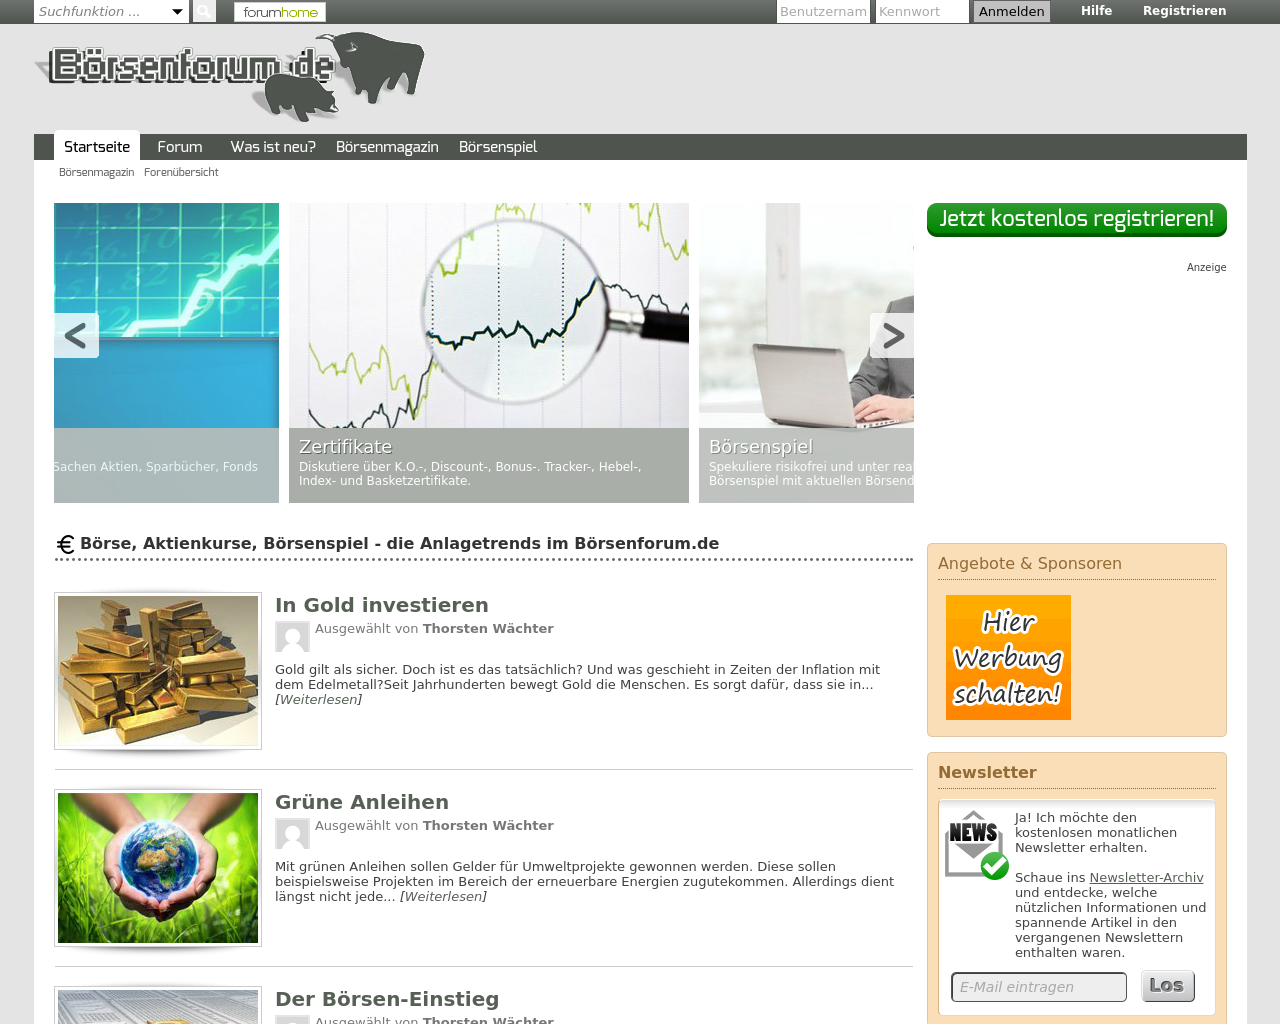 Börsenforum-Advertising-Reviews-Pricing